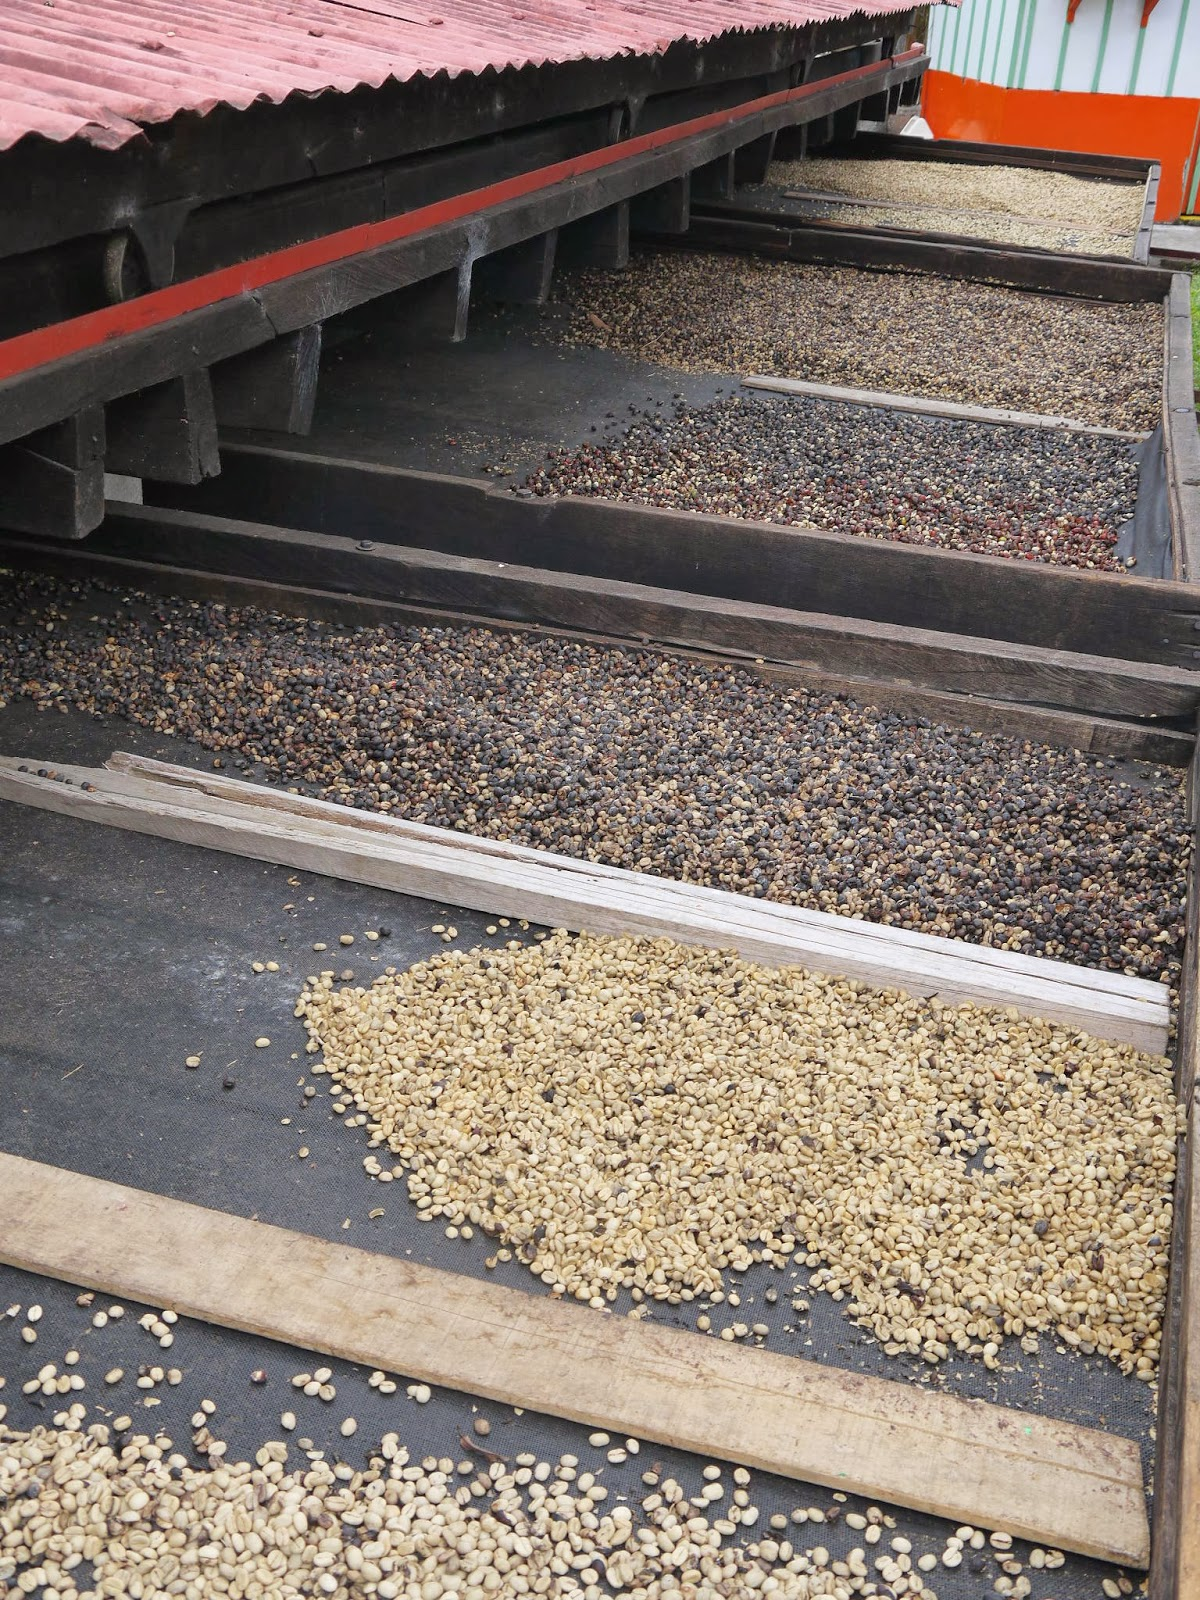 Temps De Conservation Du Caf Ef Bf Bd En Grain